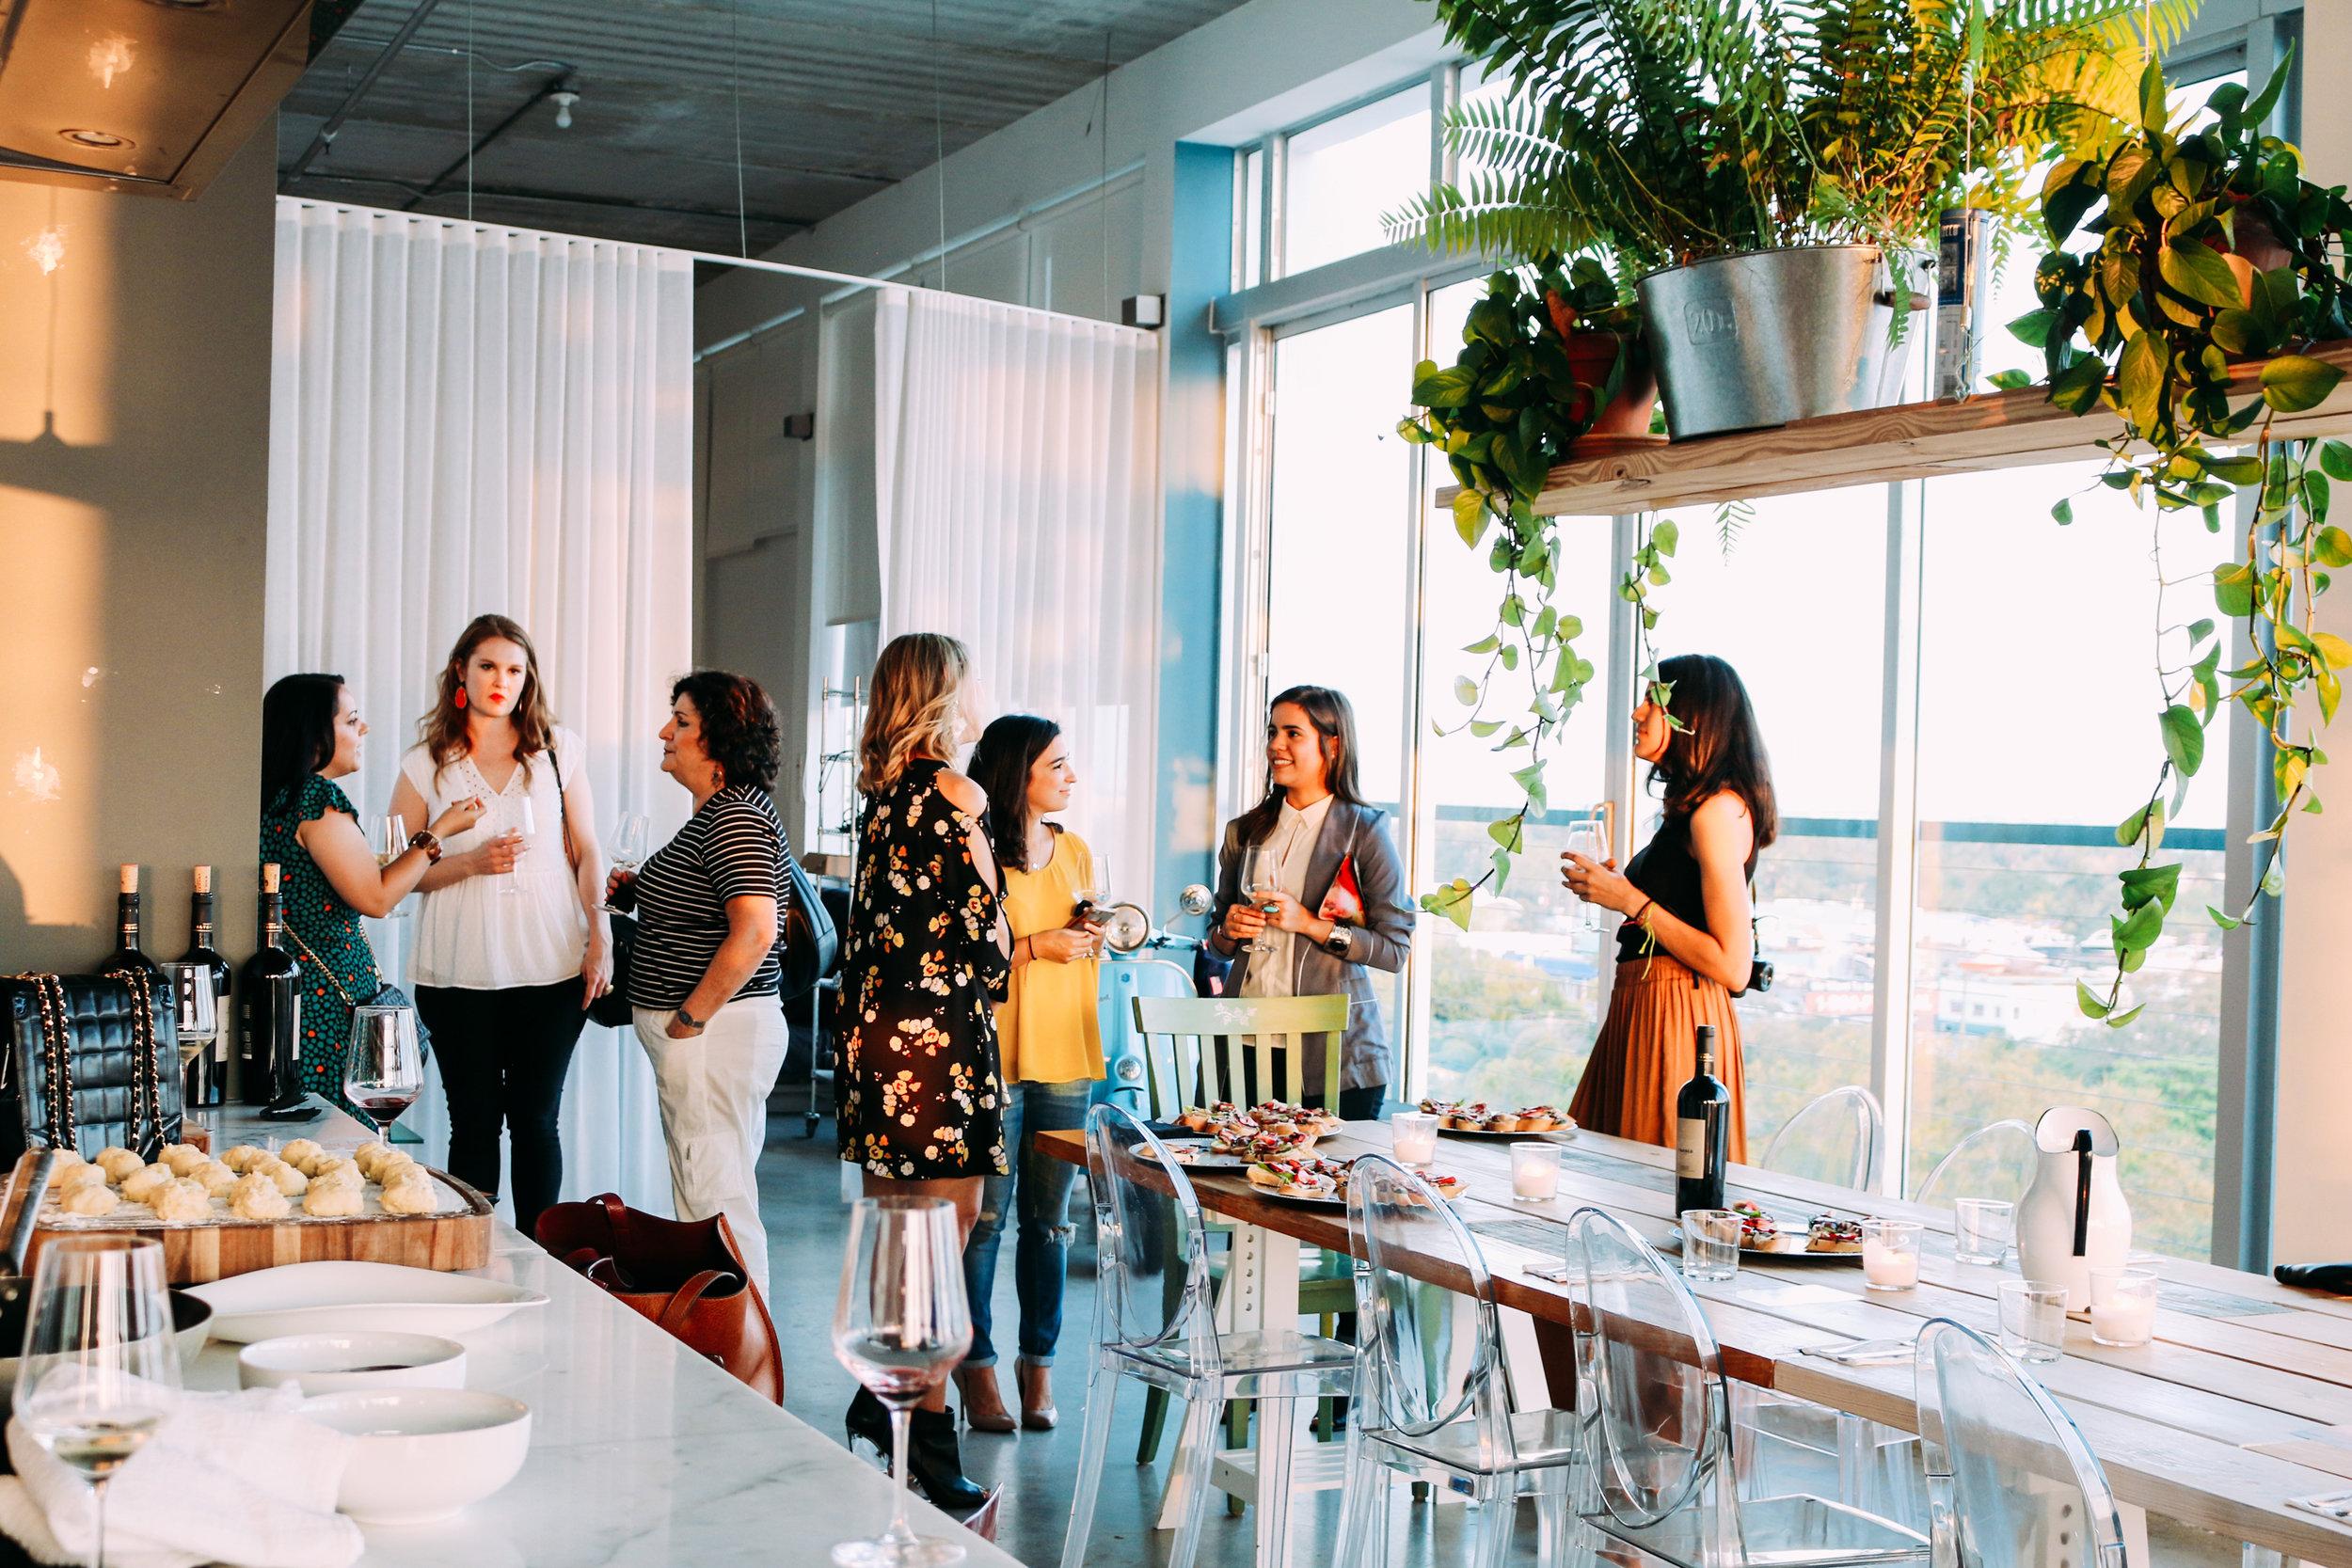 Women Who Wine Uncorked Conversations-Miami Wine Events-Wine Tasting Miami-42.jpg